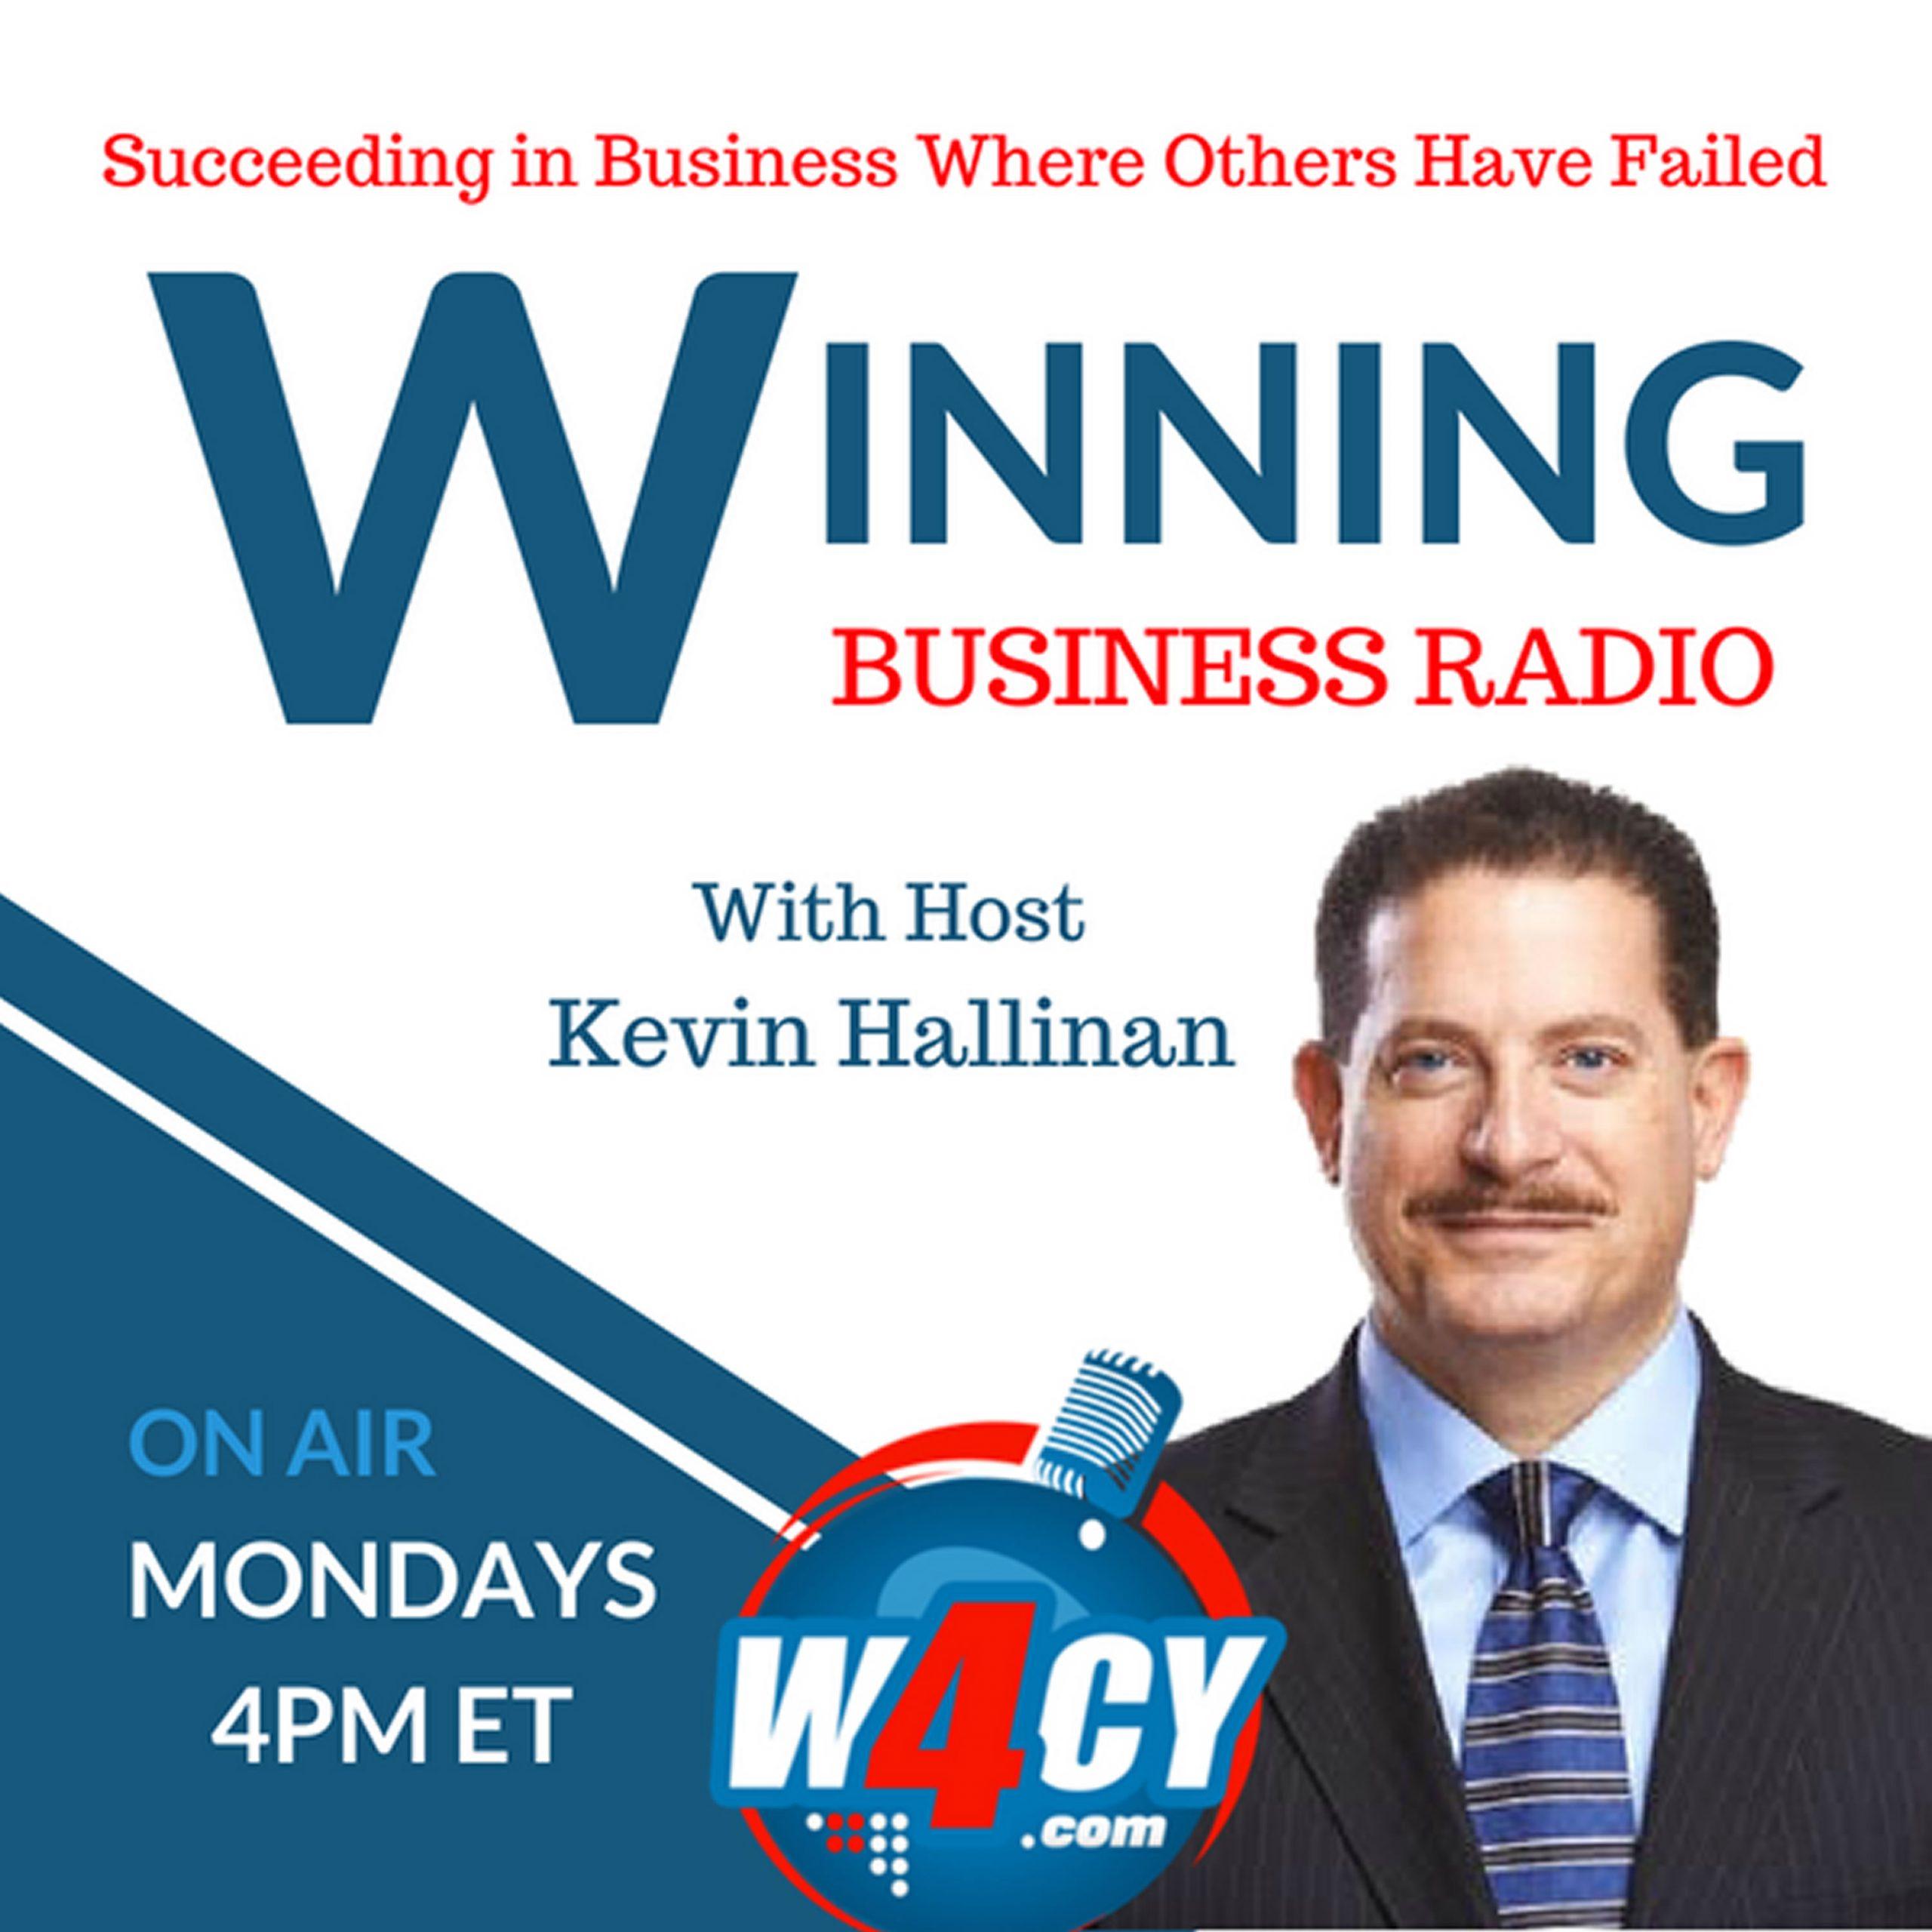 Winning Business Radio with Kevin Hallinan